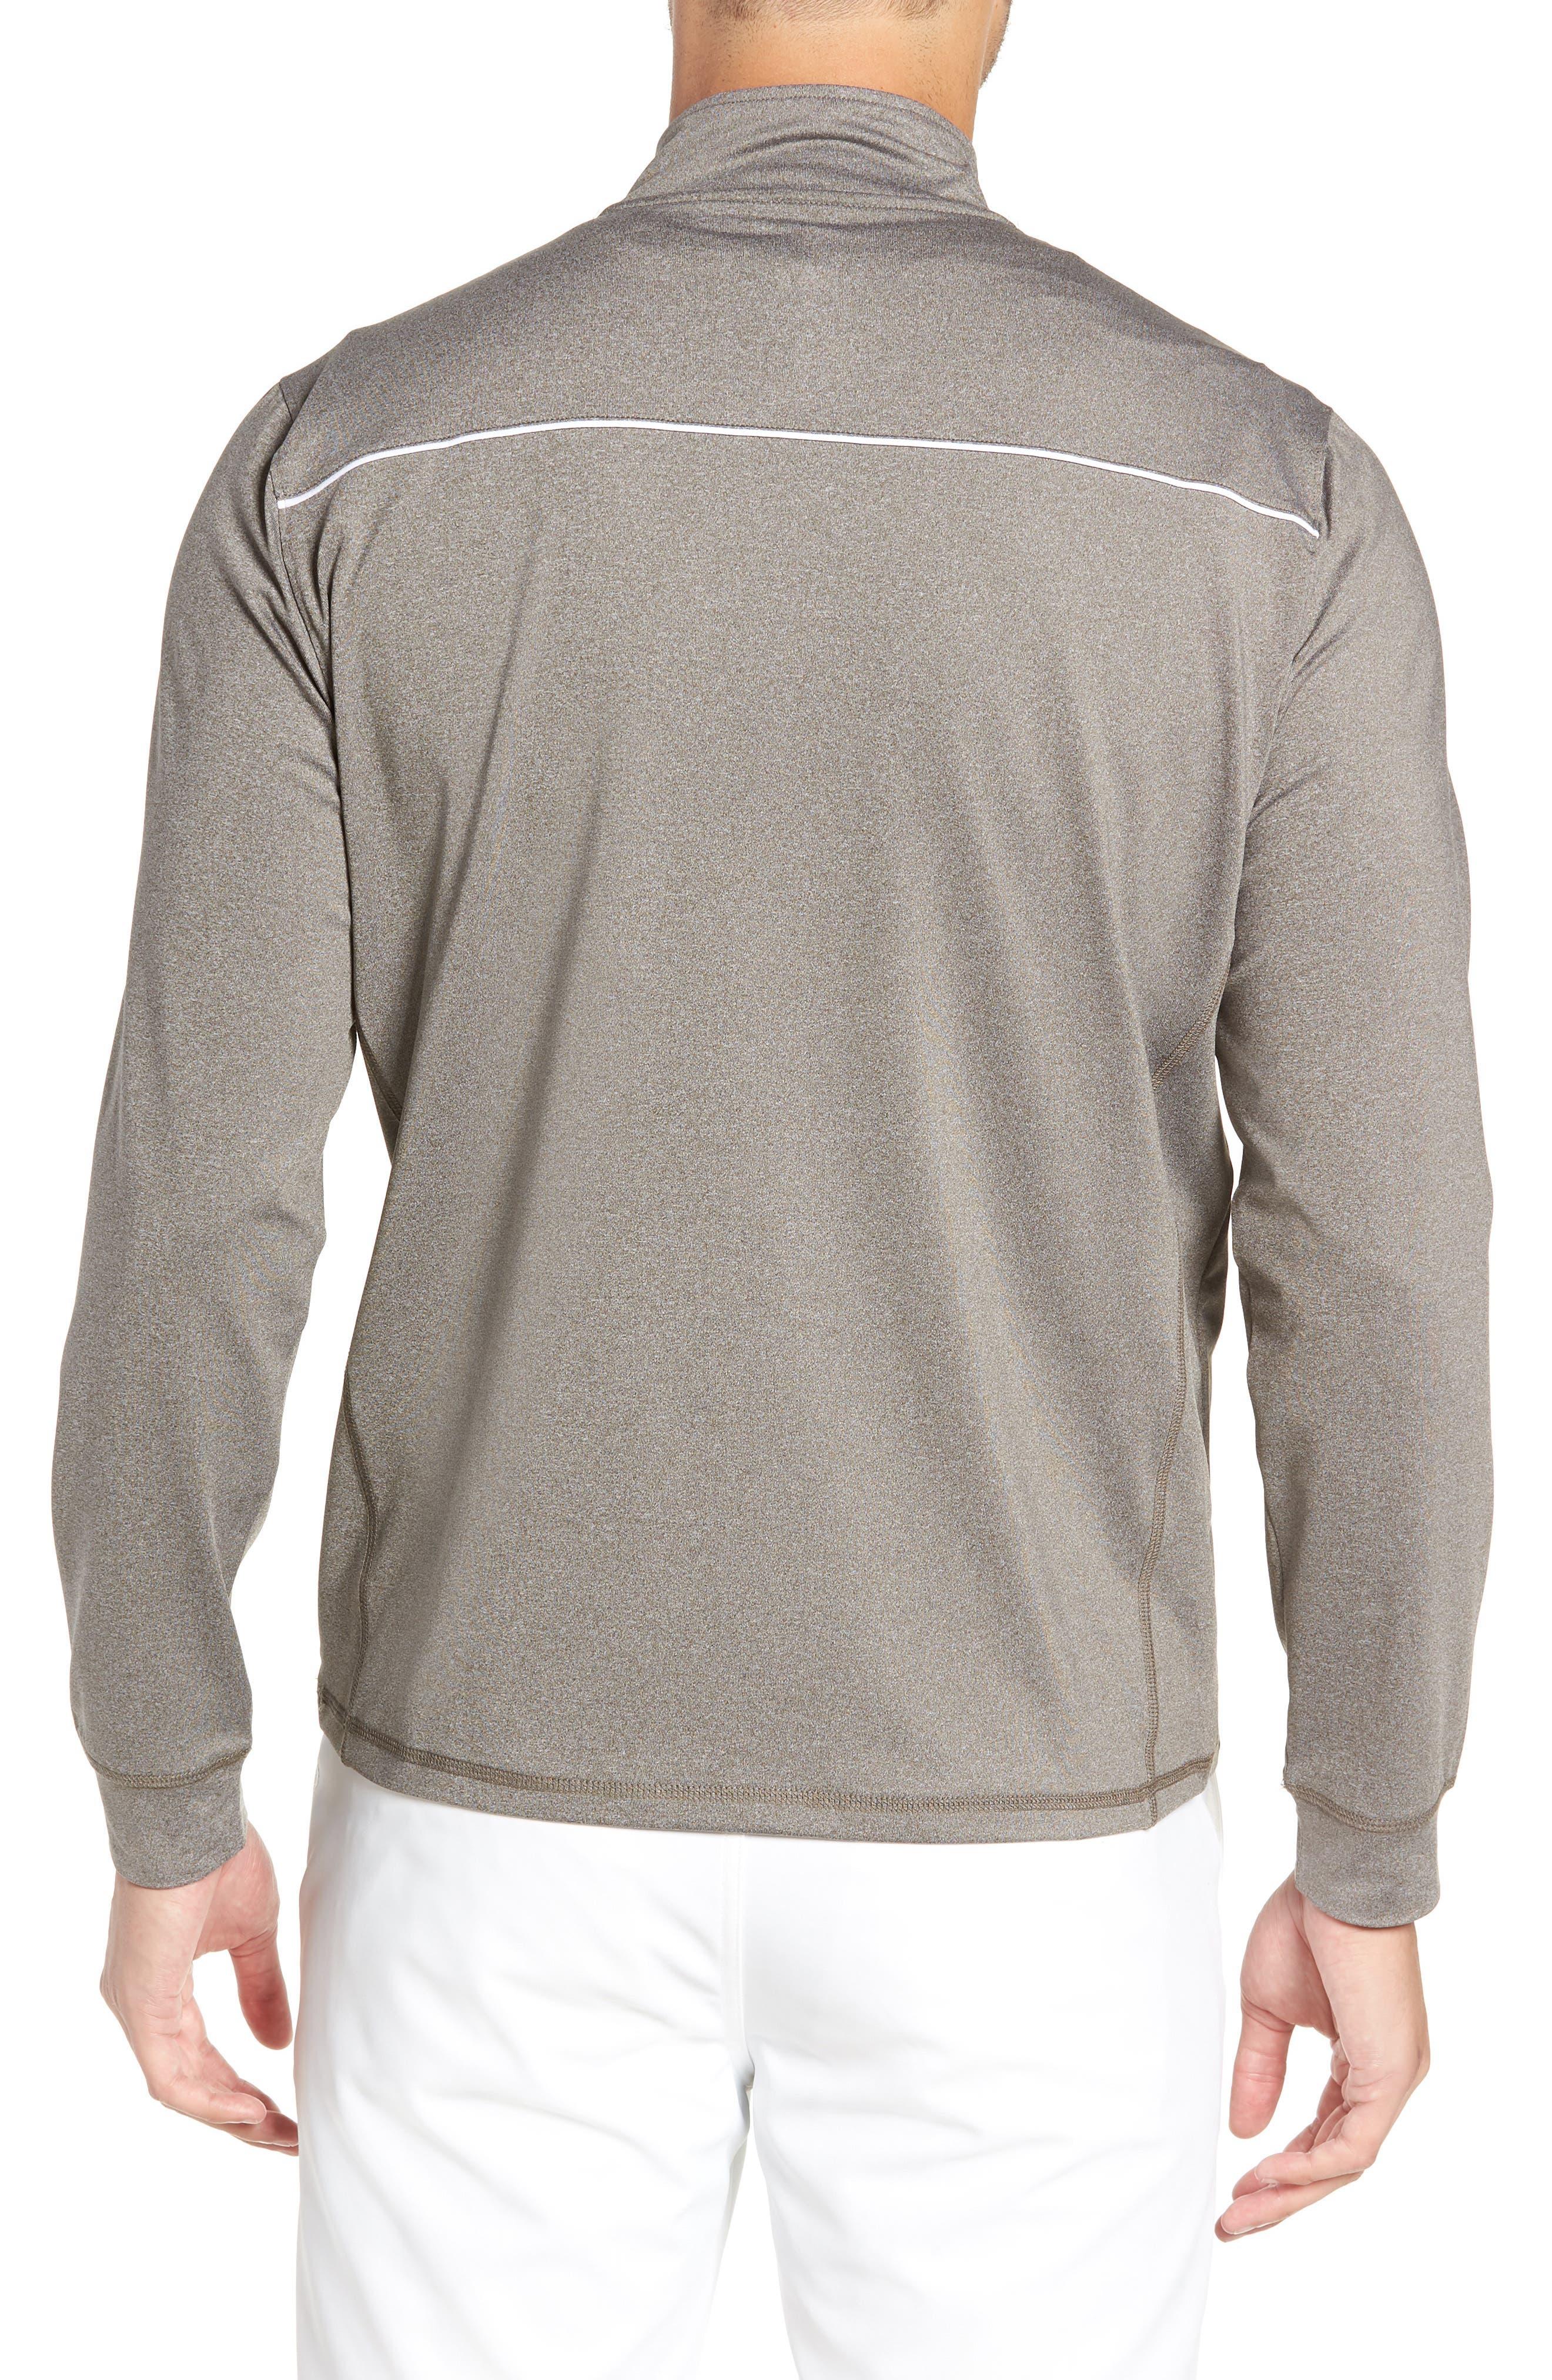 Lammie Regular Fit Quarter Zip Prep-Formance Pullover,                             Alternate thumbnail 2, color,                             METEOR